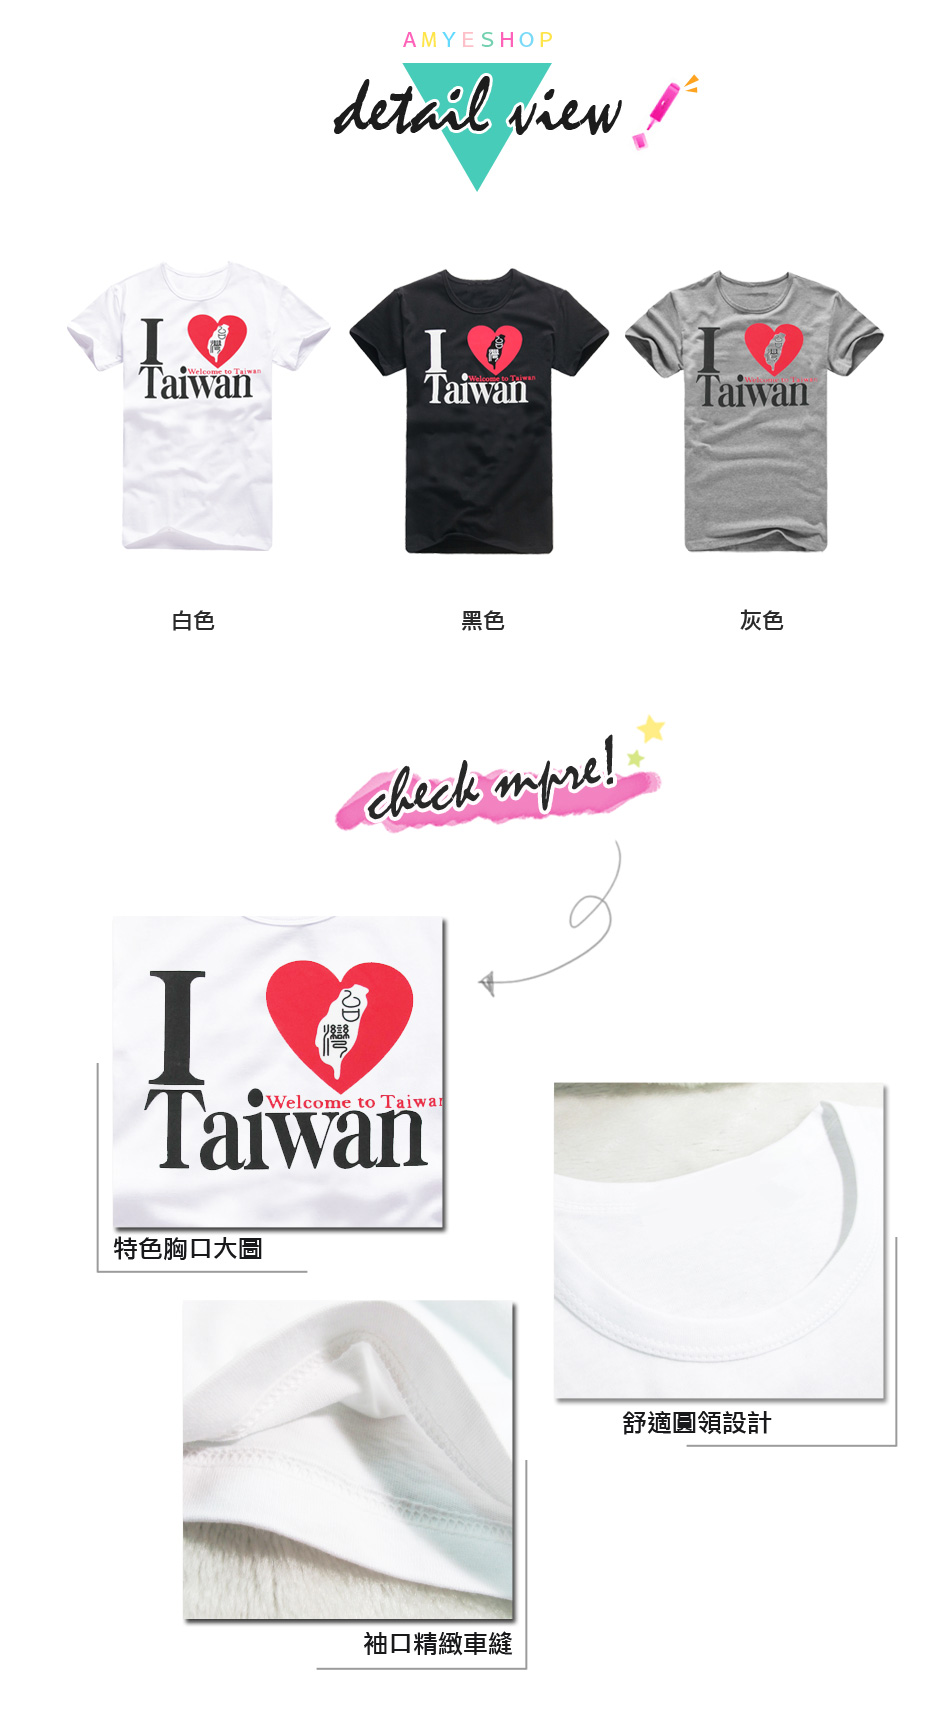 MIT純棉 T恤 短袖T恤 情侶T恤 造型T恤 個性T恤 LOVE -TAIWAN I台灣愛心T【D8057】艾咪E舖